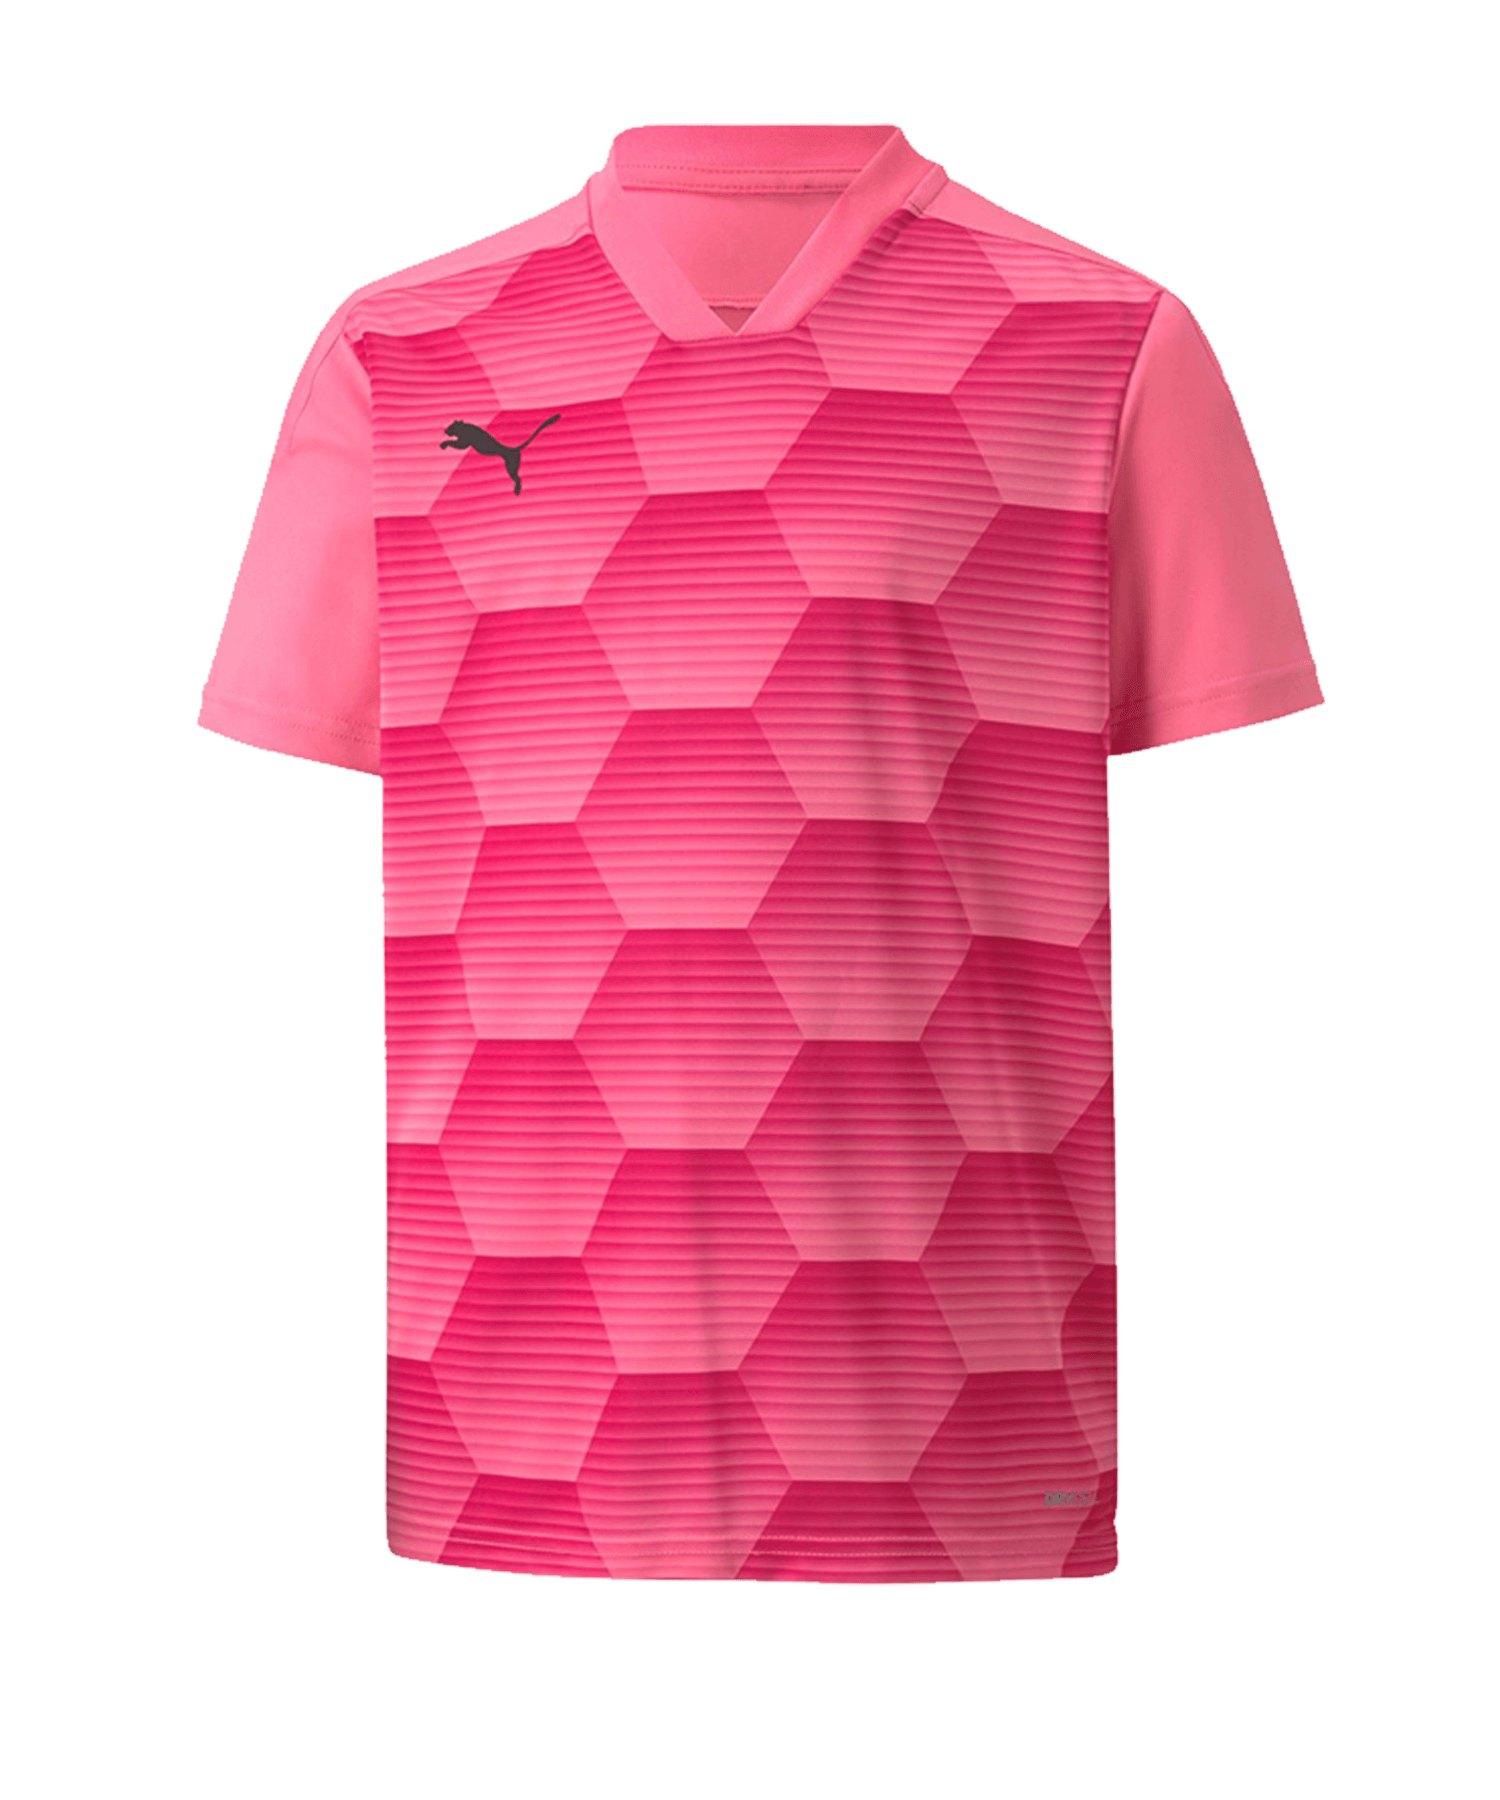 Puma teamFINAL 21 Graphic Trikot kurzarm Pink F22 - pink